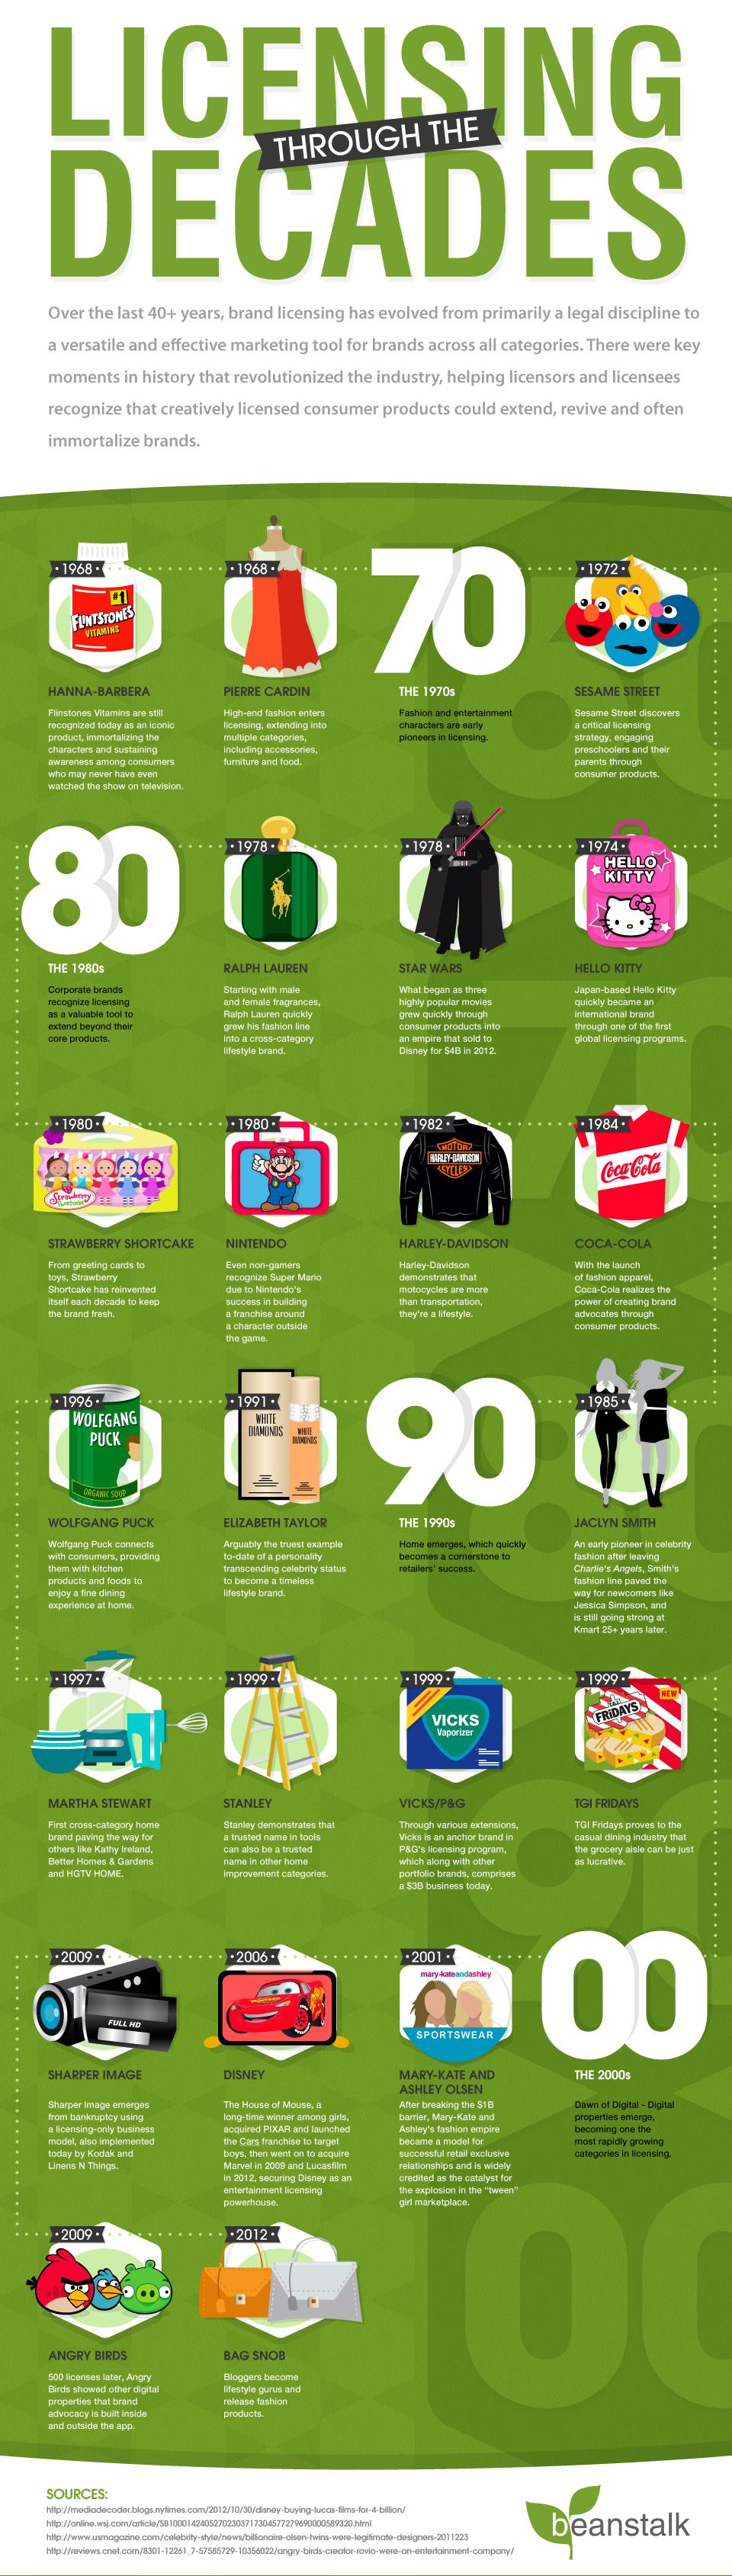 Brand Licensing Deals